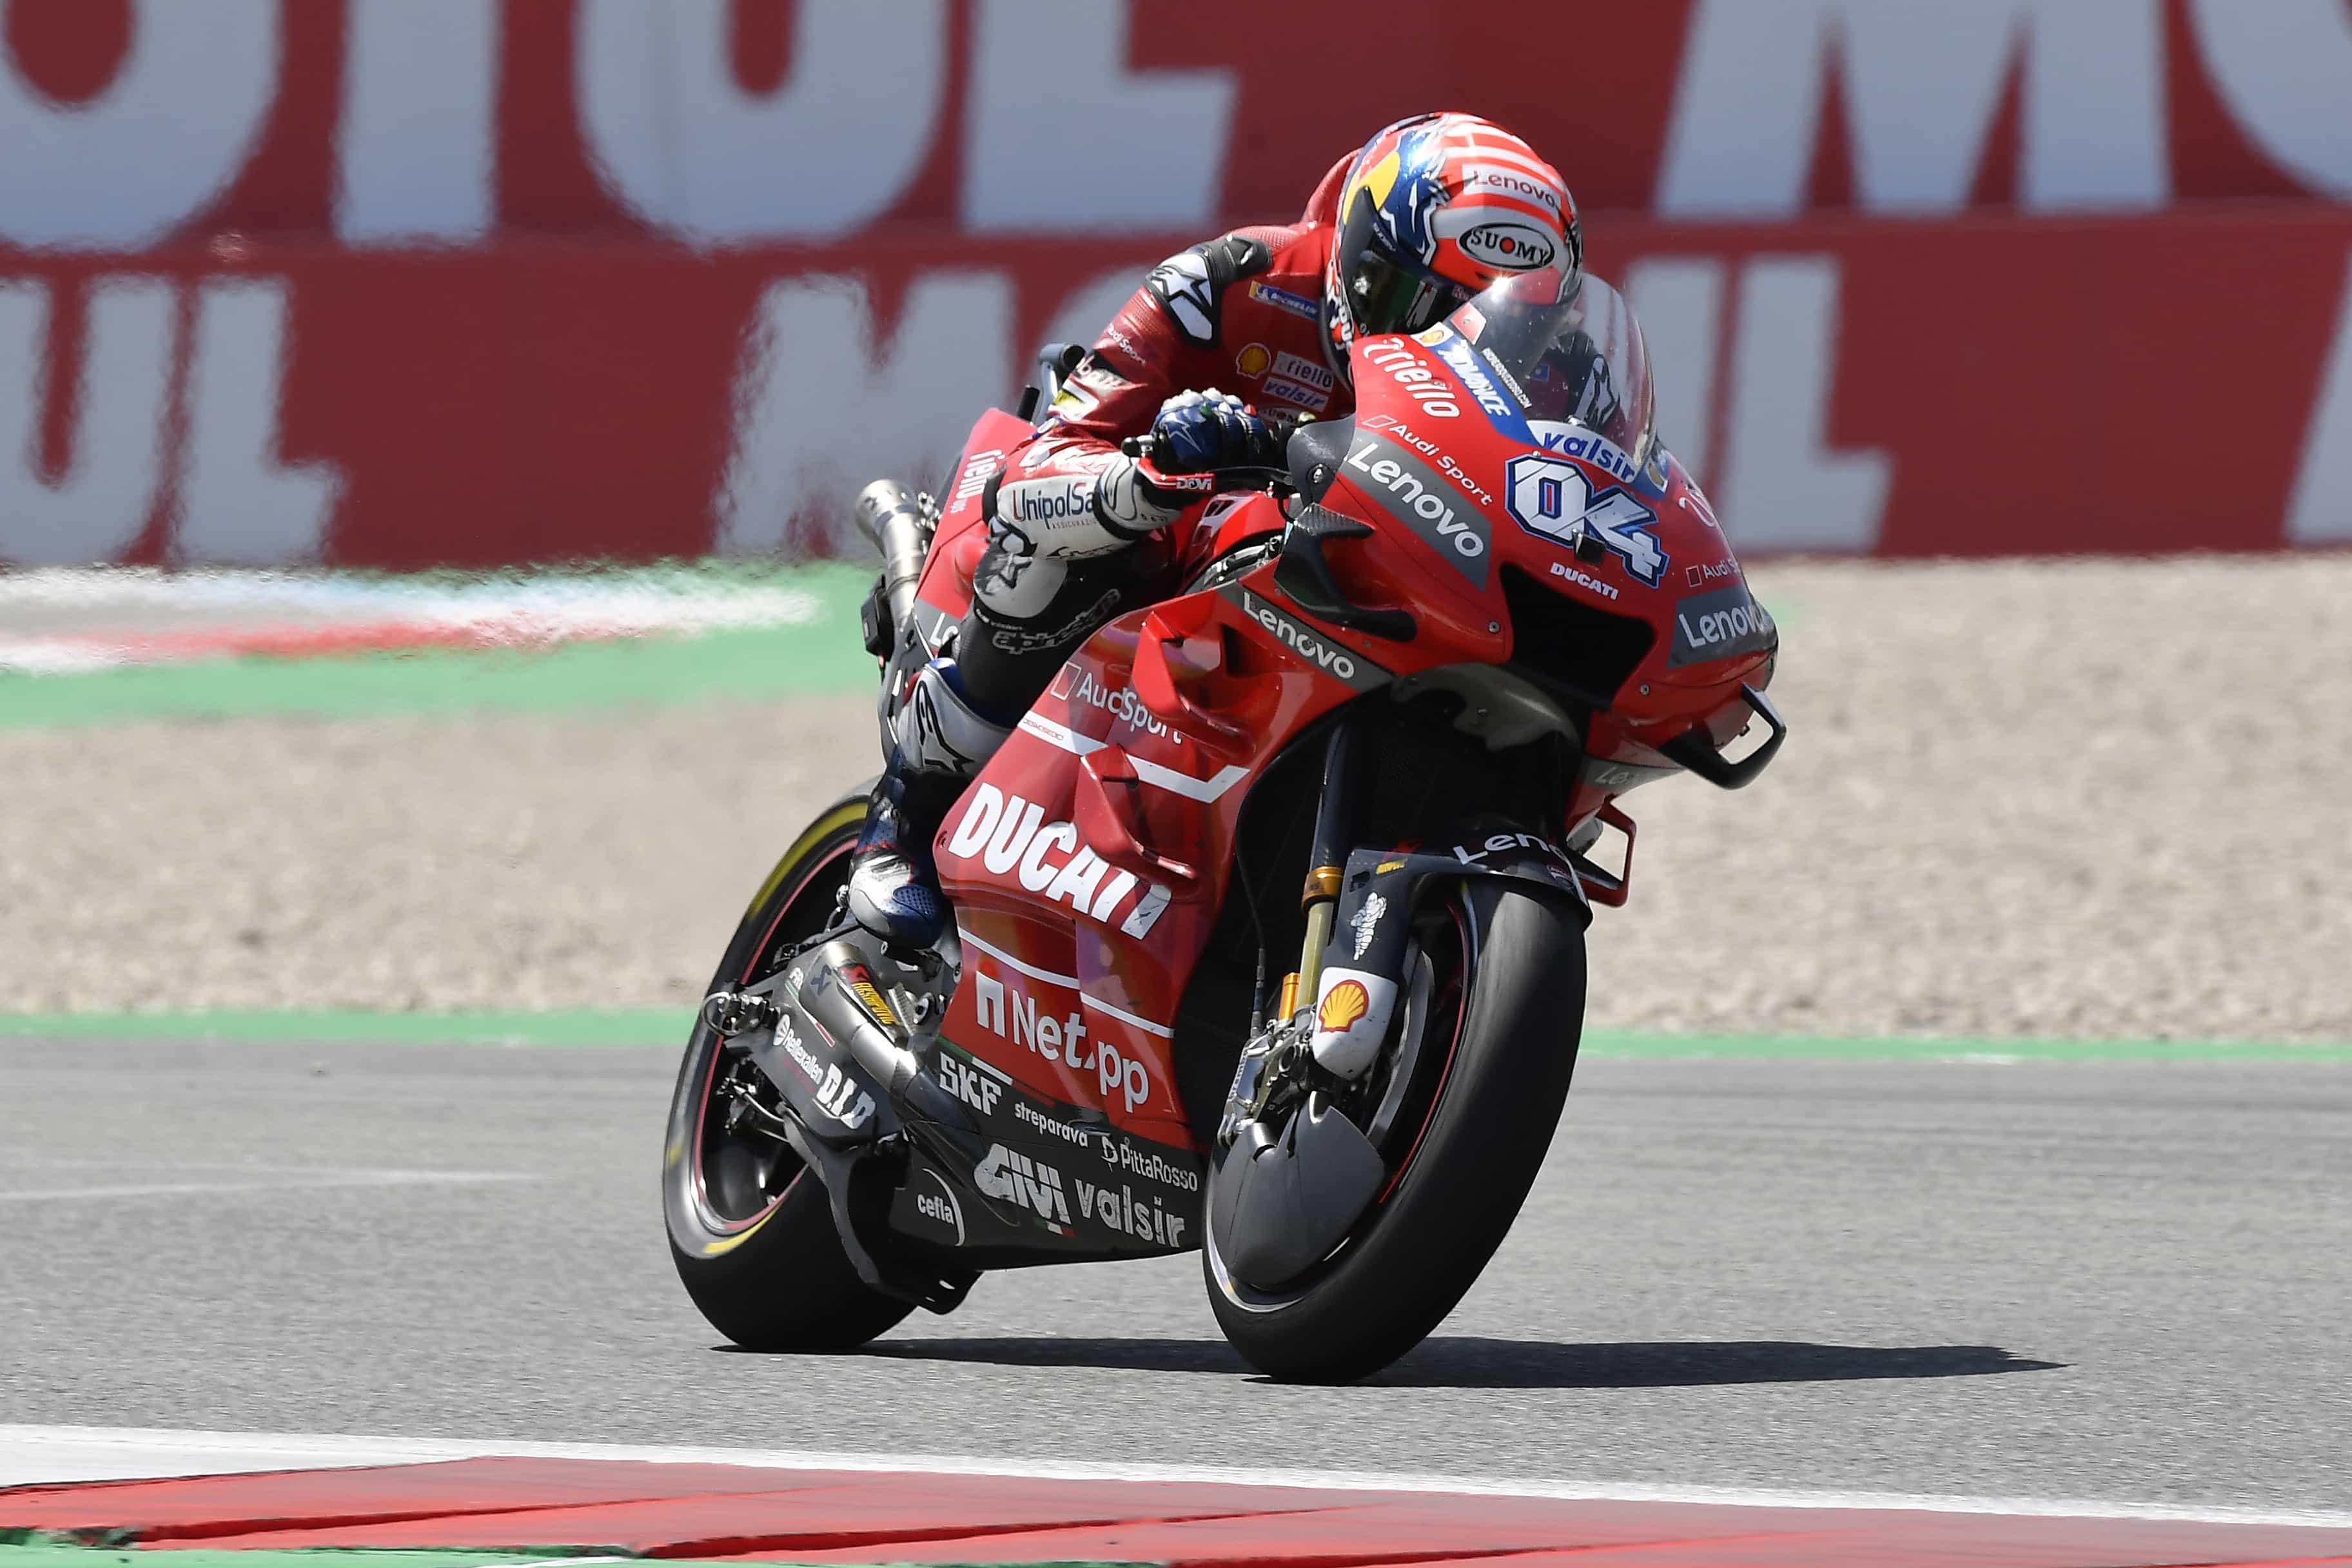 MotoGP第8戦のオランダGPでドヴィツィオーゾは4位、ペトルッチは6位フィニッシュ